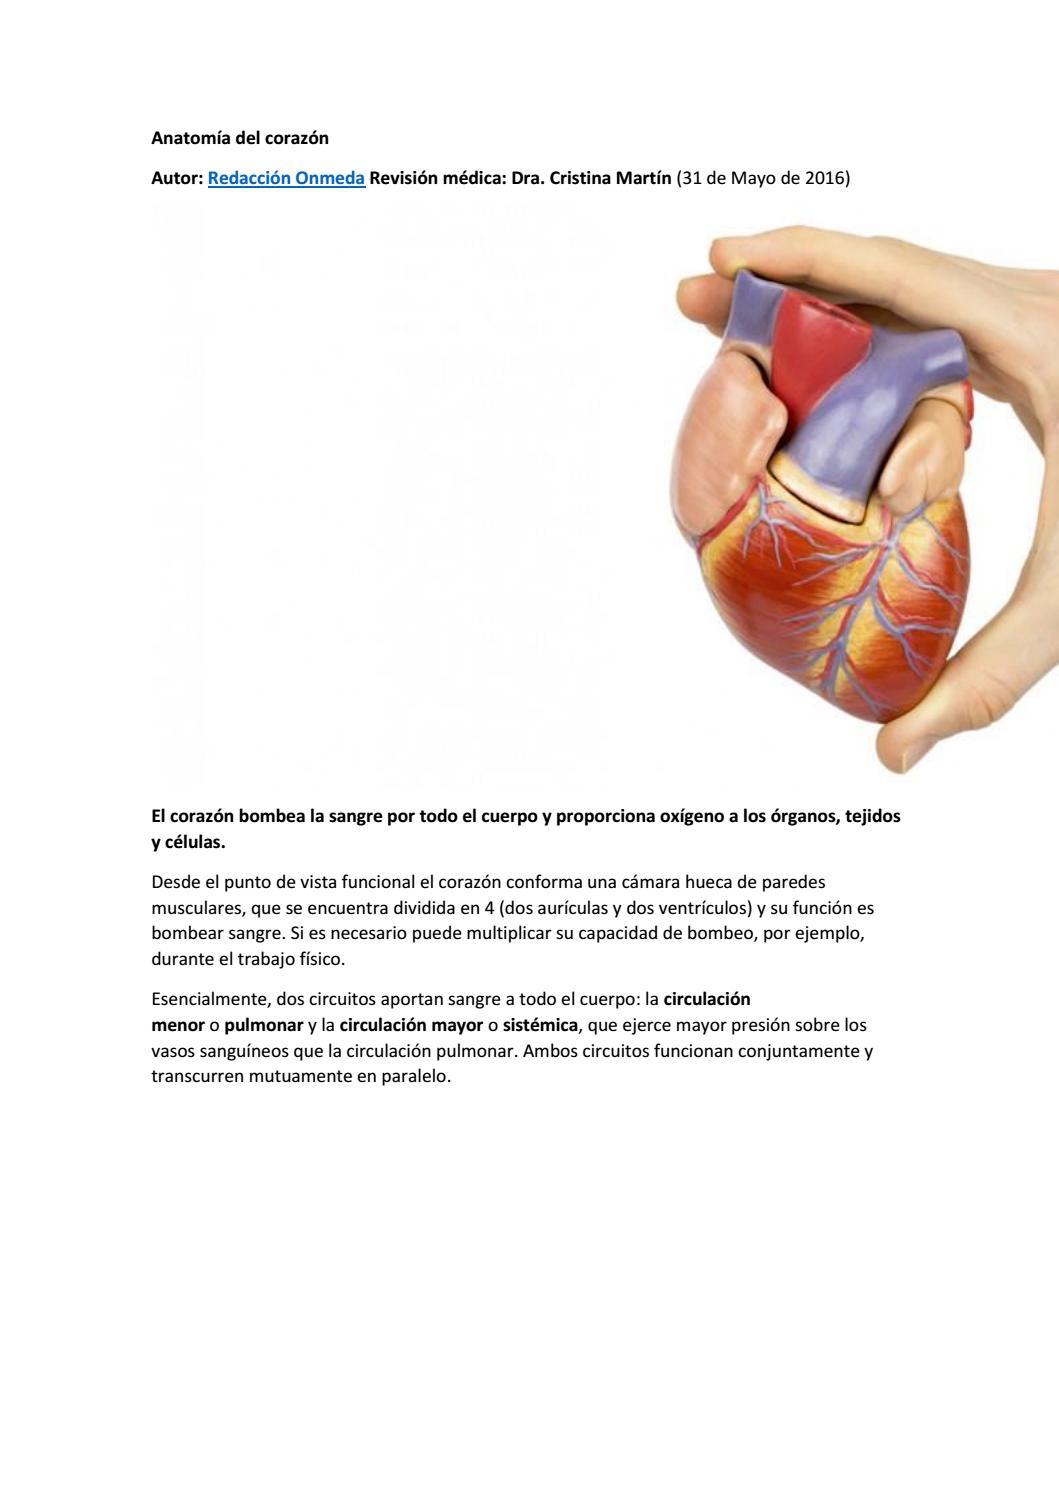 Anatomía del corazón by EdiSson Lml morocho - issuu